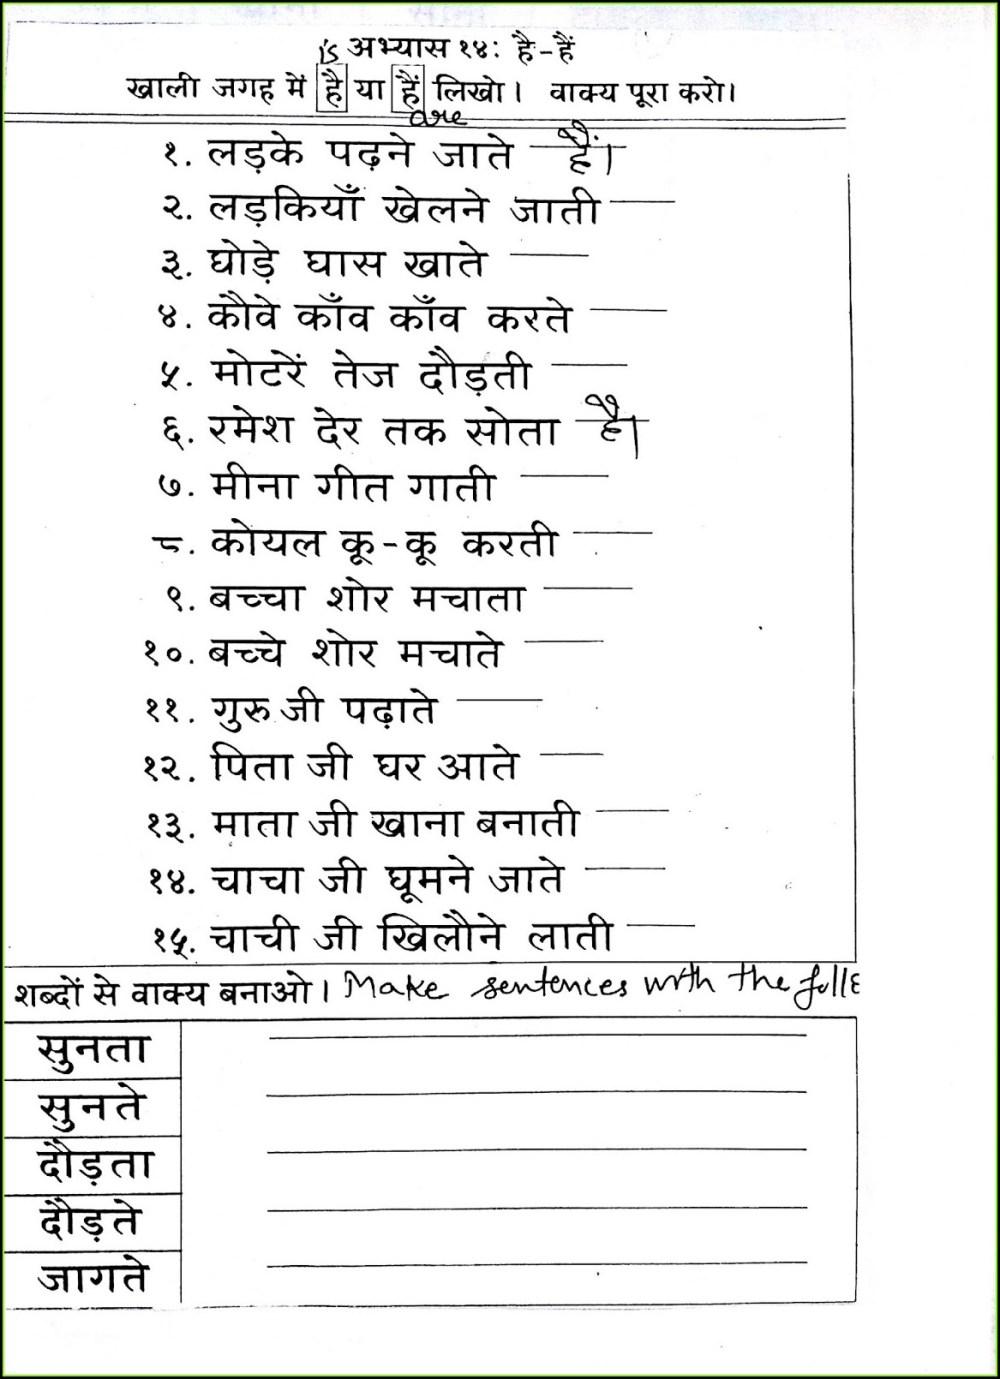 medium resolution of Hindi Ling Worksheet   Printable Worksheets and Activities for Teachers